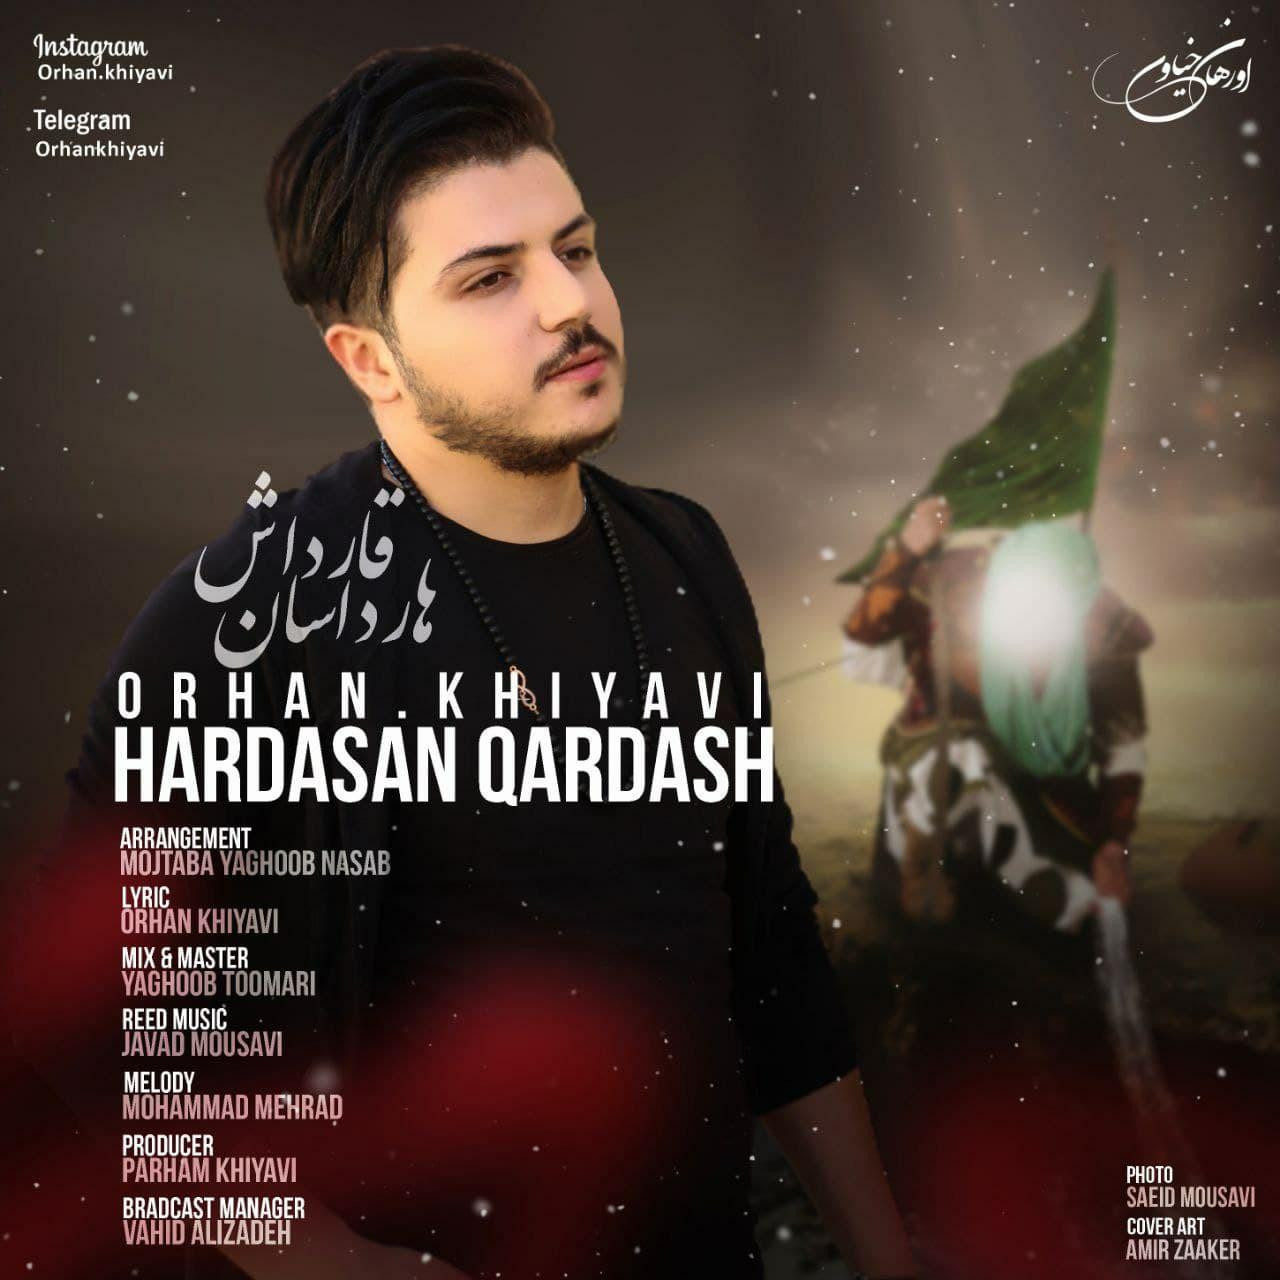 https://s20.picofile.com/file/8441432134/13Orhan_Khiyavi_Hardasan_Qardash.jpg